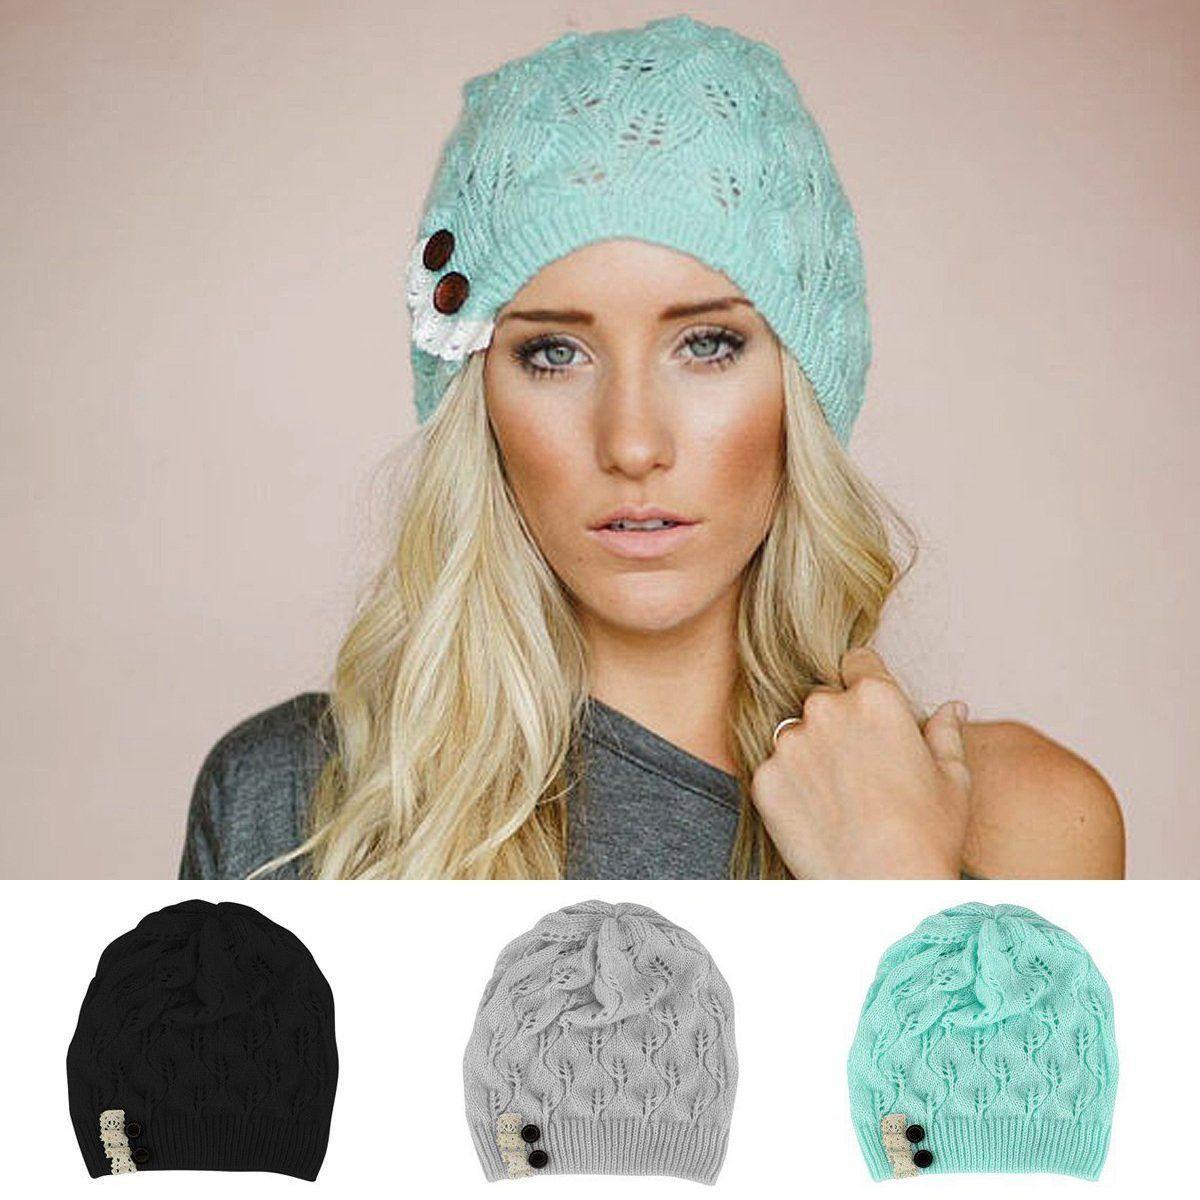 f071bfa1a4c Fashion Women Winter Warm Beret Braided Baggy Knit Crochet Beanie Hat Ski  Cap